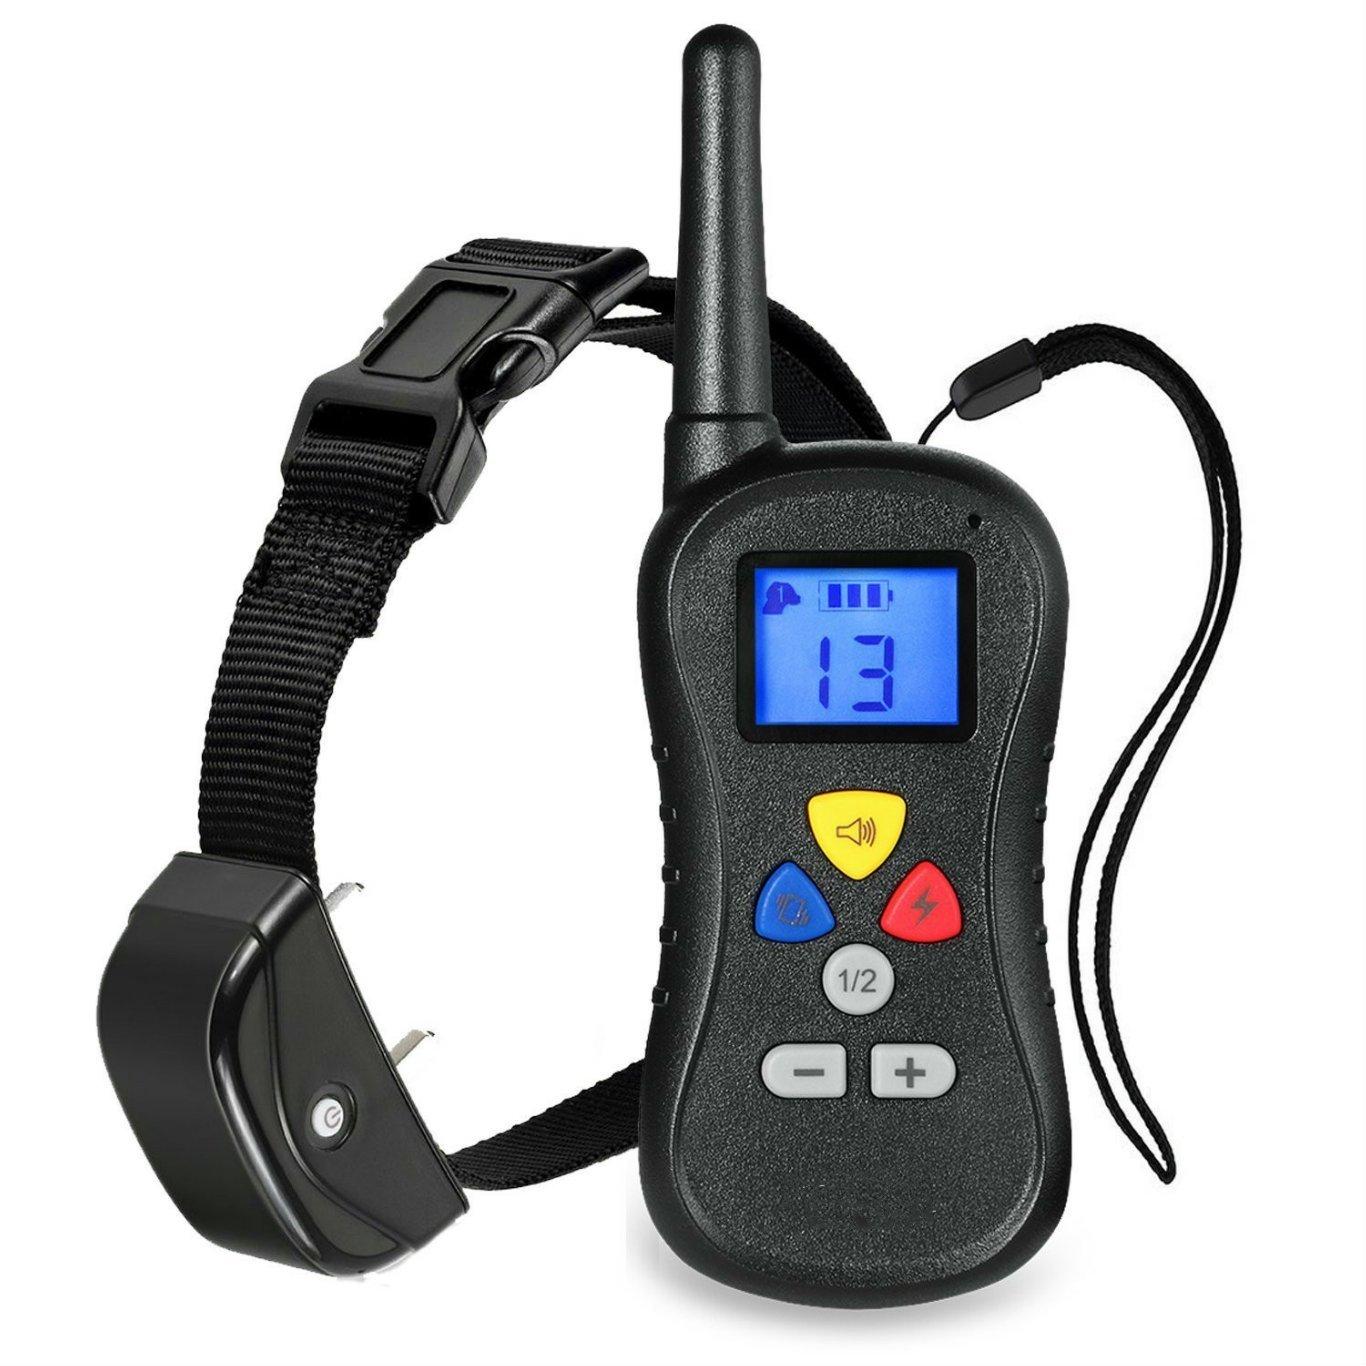 JJX-TECH™ Wireless LCD Remote Dog Training Collar